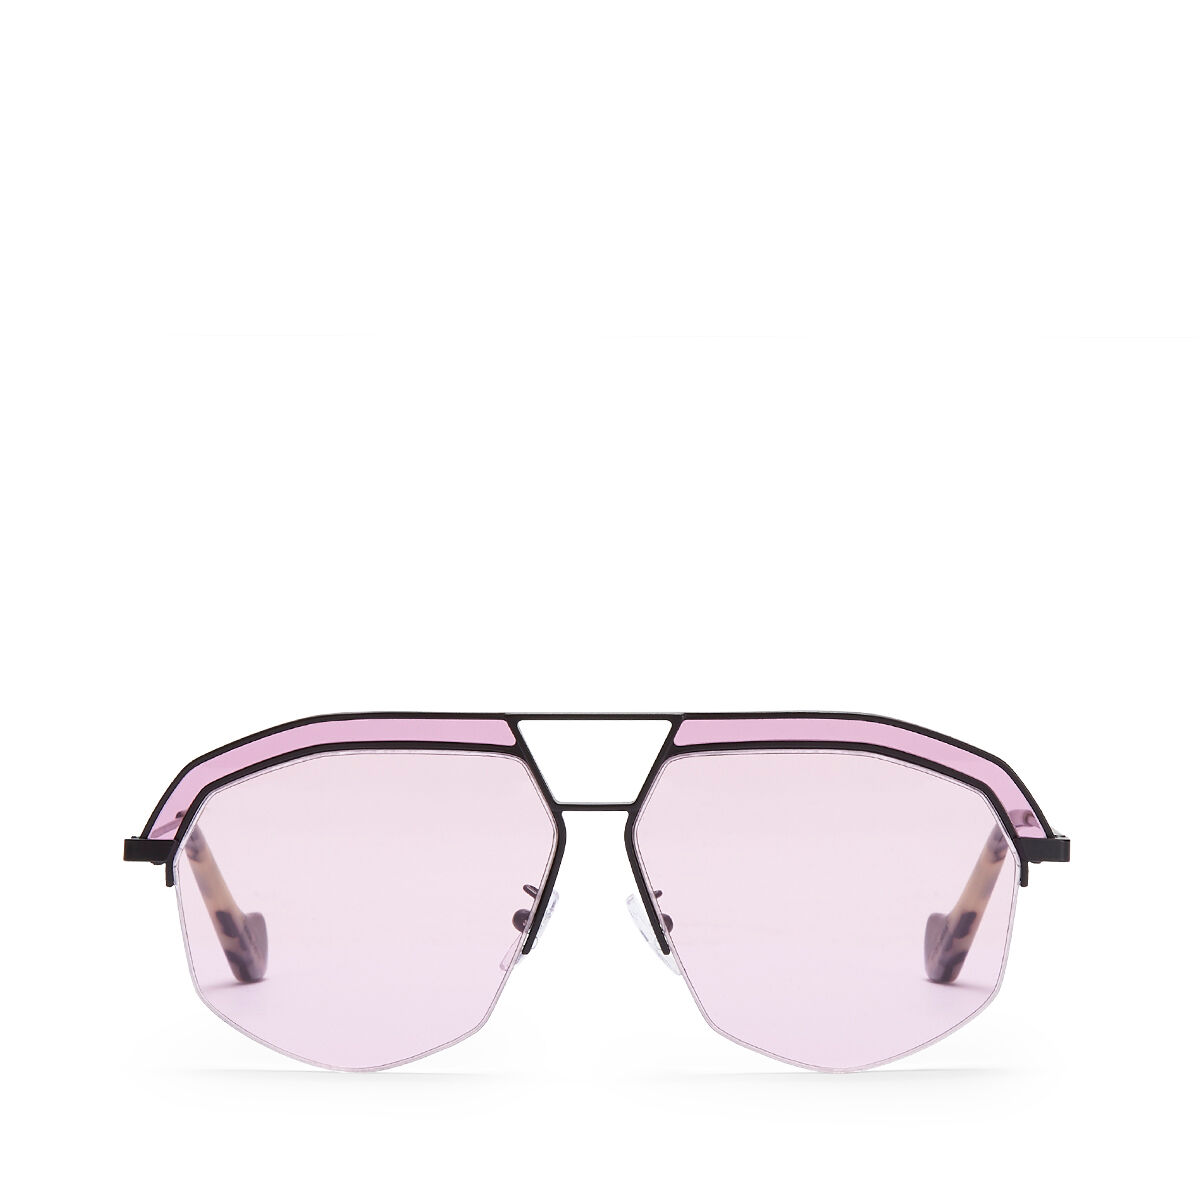 LOEWE Geometrical Sunglasses Matte Black/Pink all